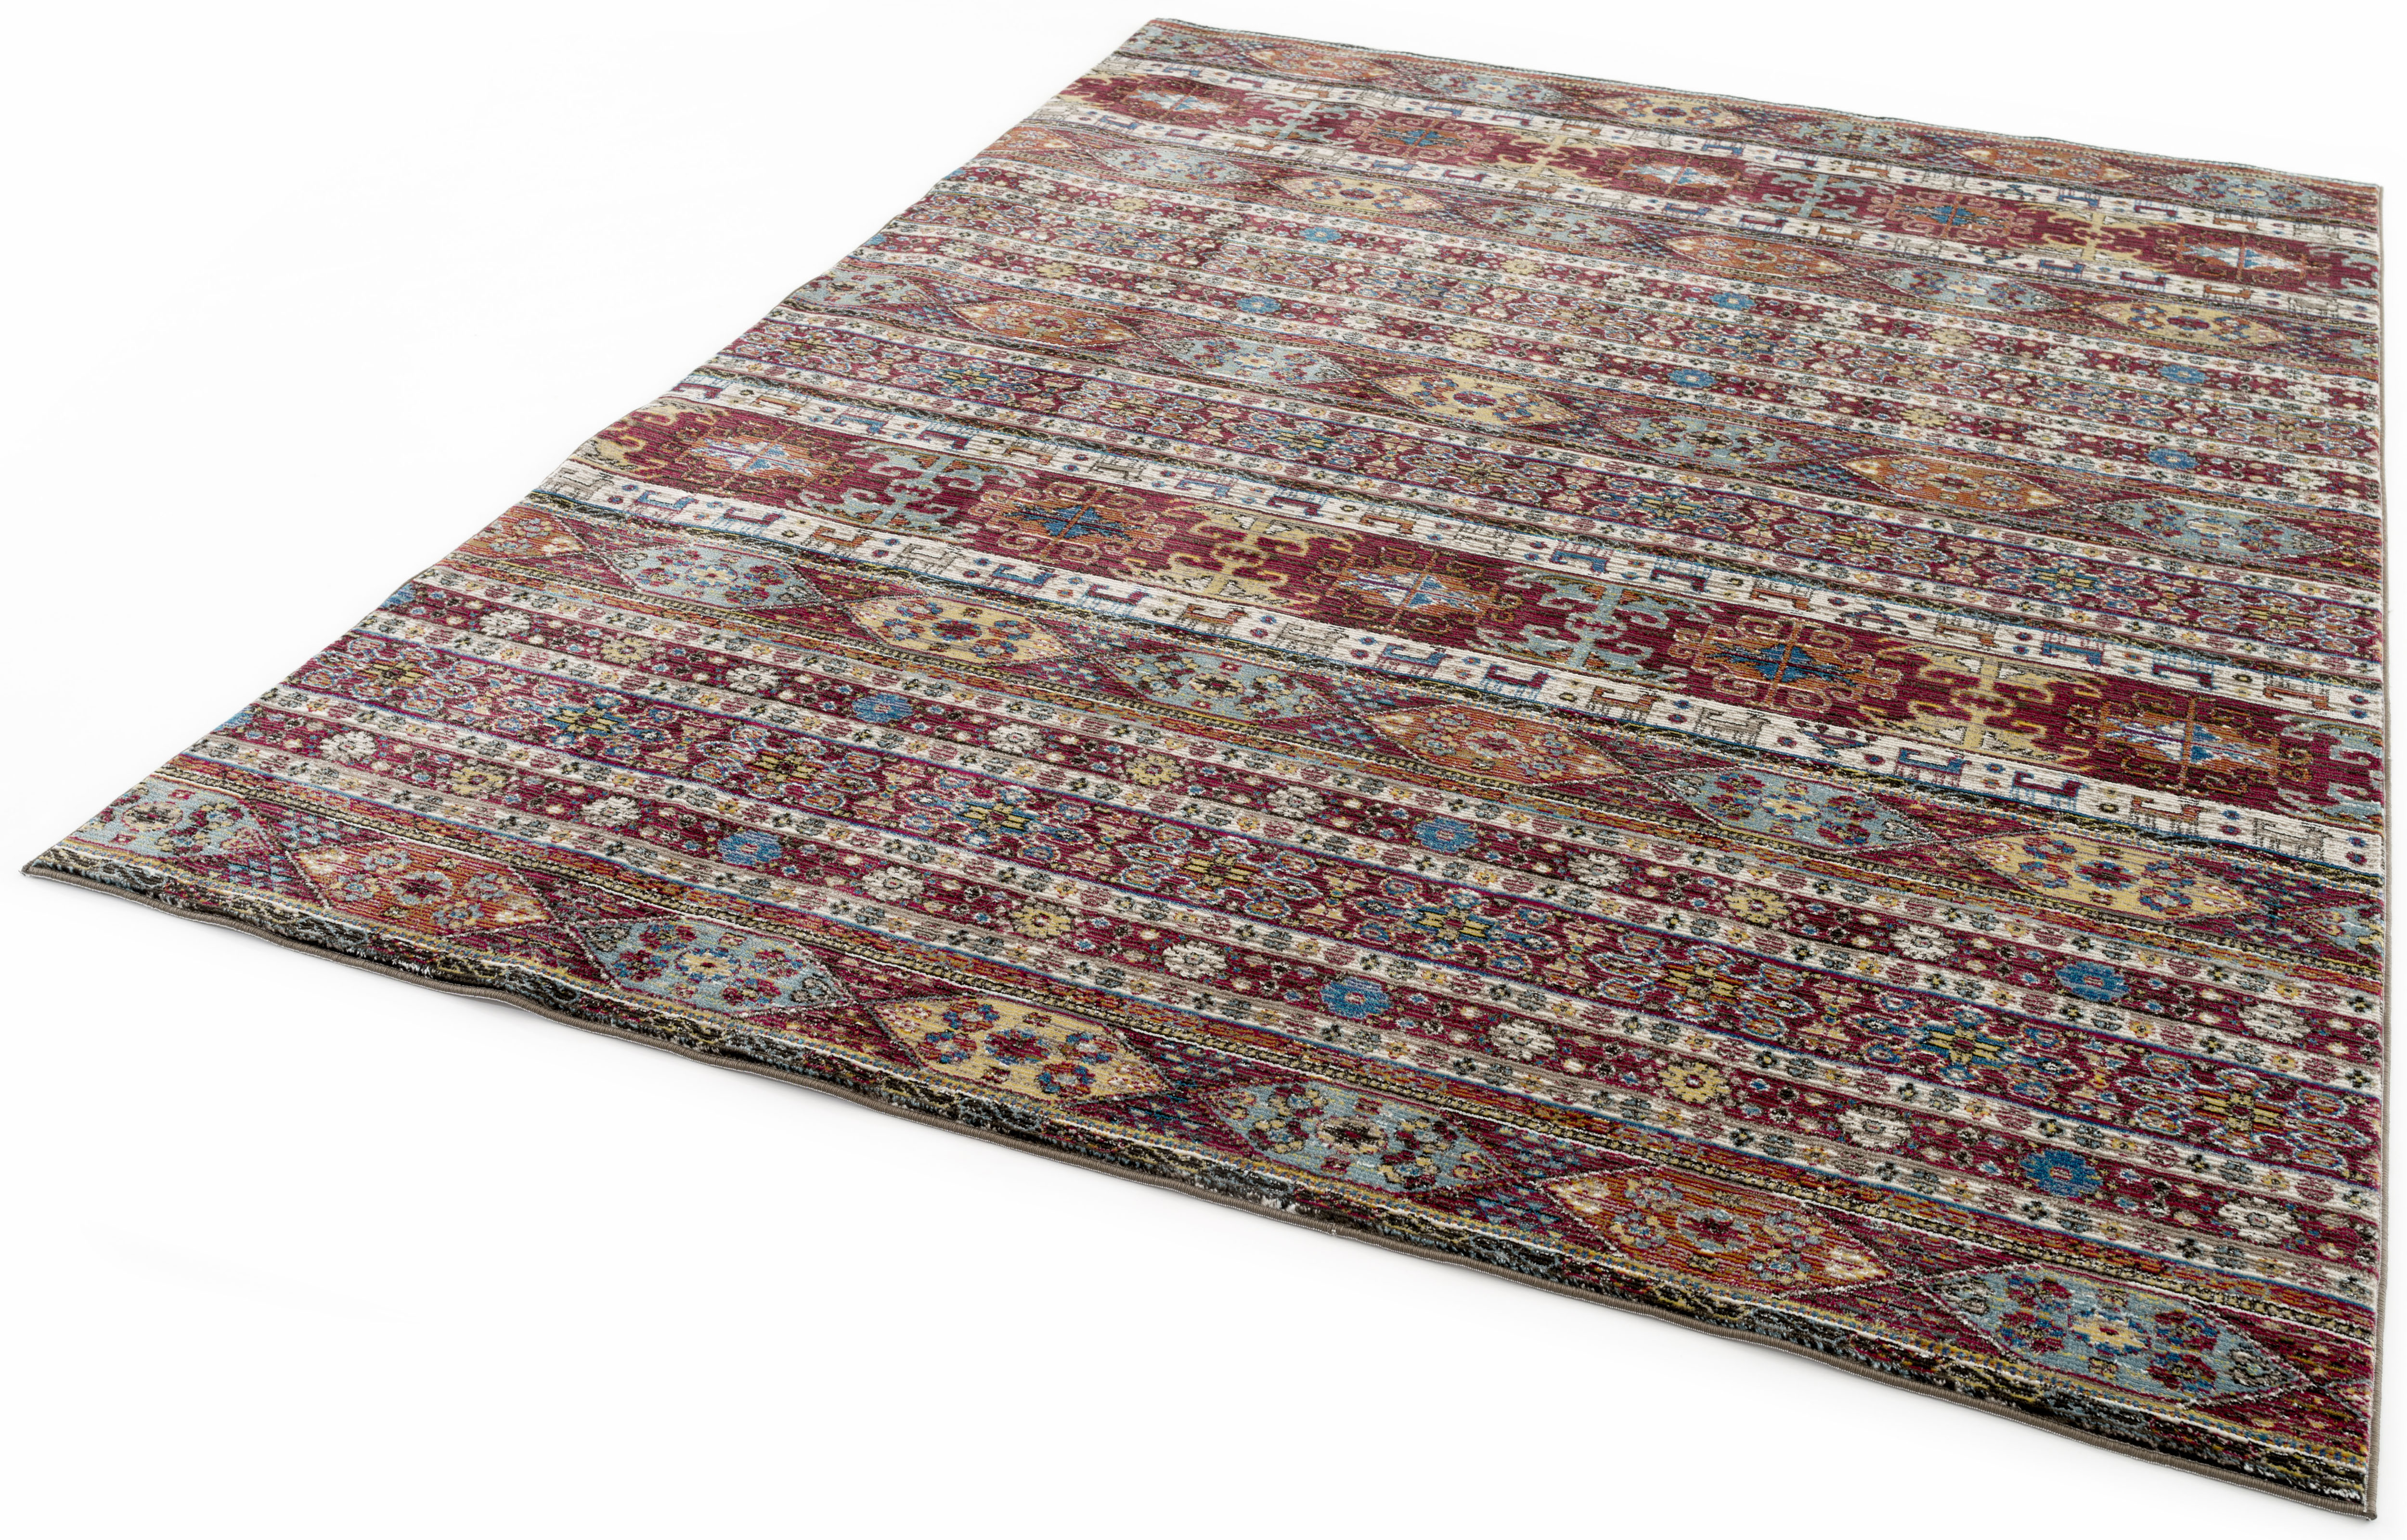 Teppich, »Picasso 11601«, Festival, rechteckig, Höhe 6 mm, maschinell gewebt | Heimtextilien > Teppiche > Sonstige-Teppiche | Rot | FESTIVAL